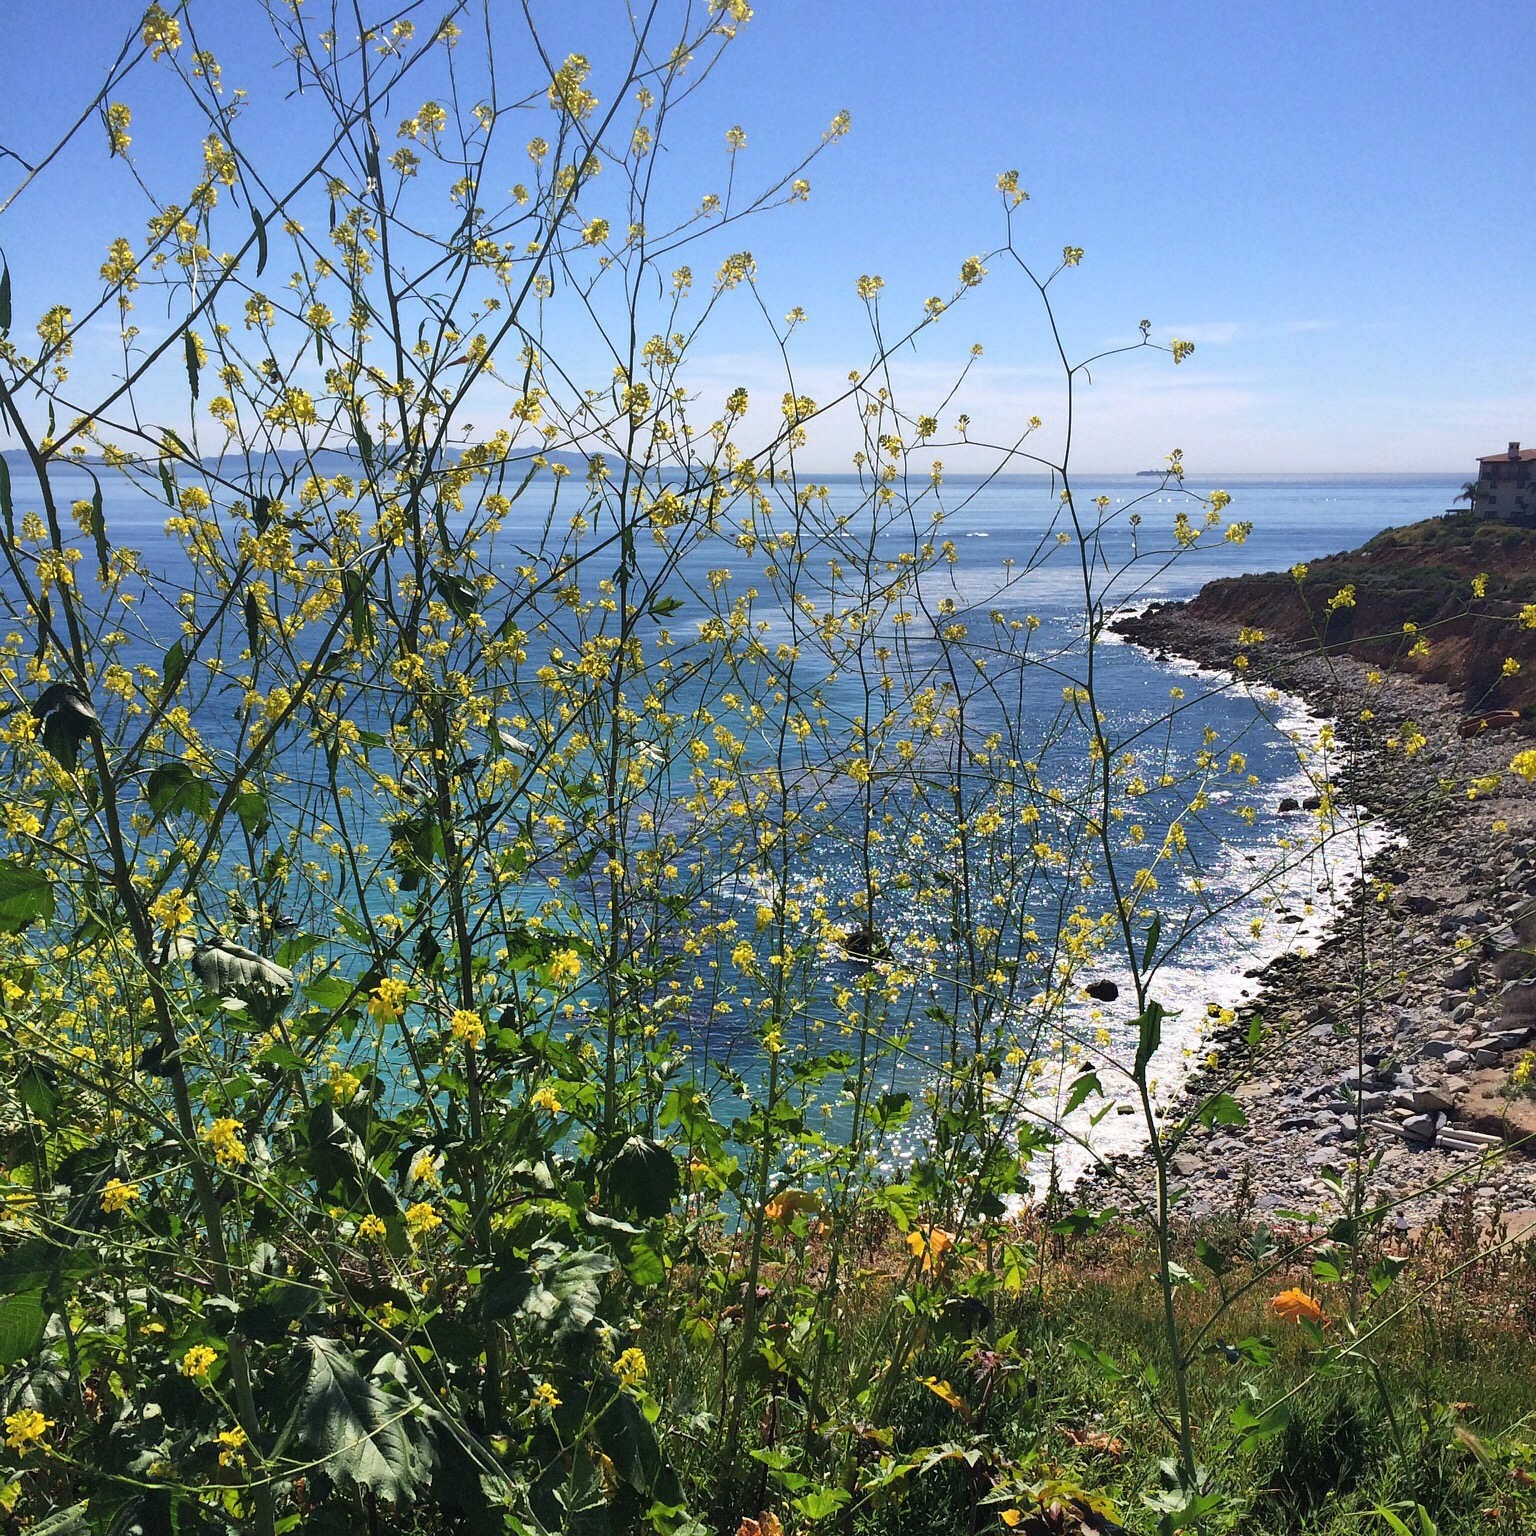 Cliffside view in Palos Verdes.